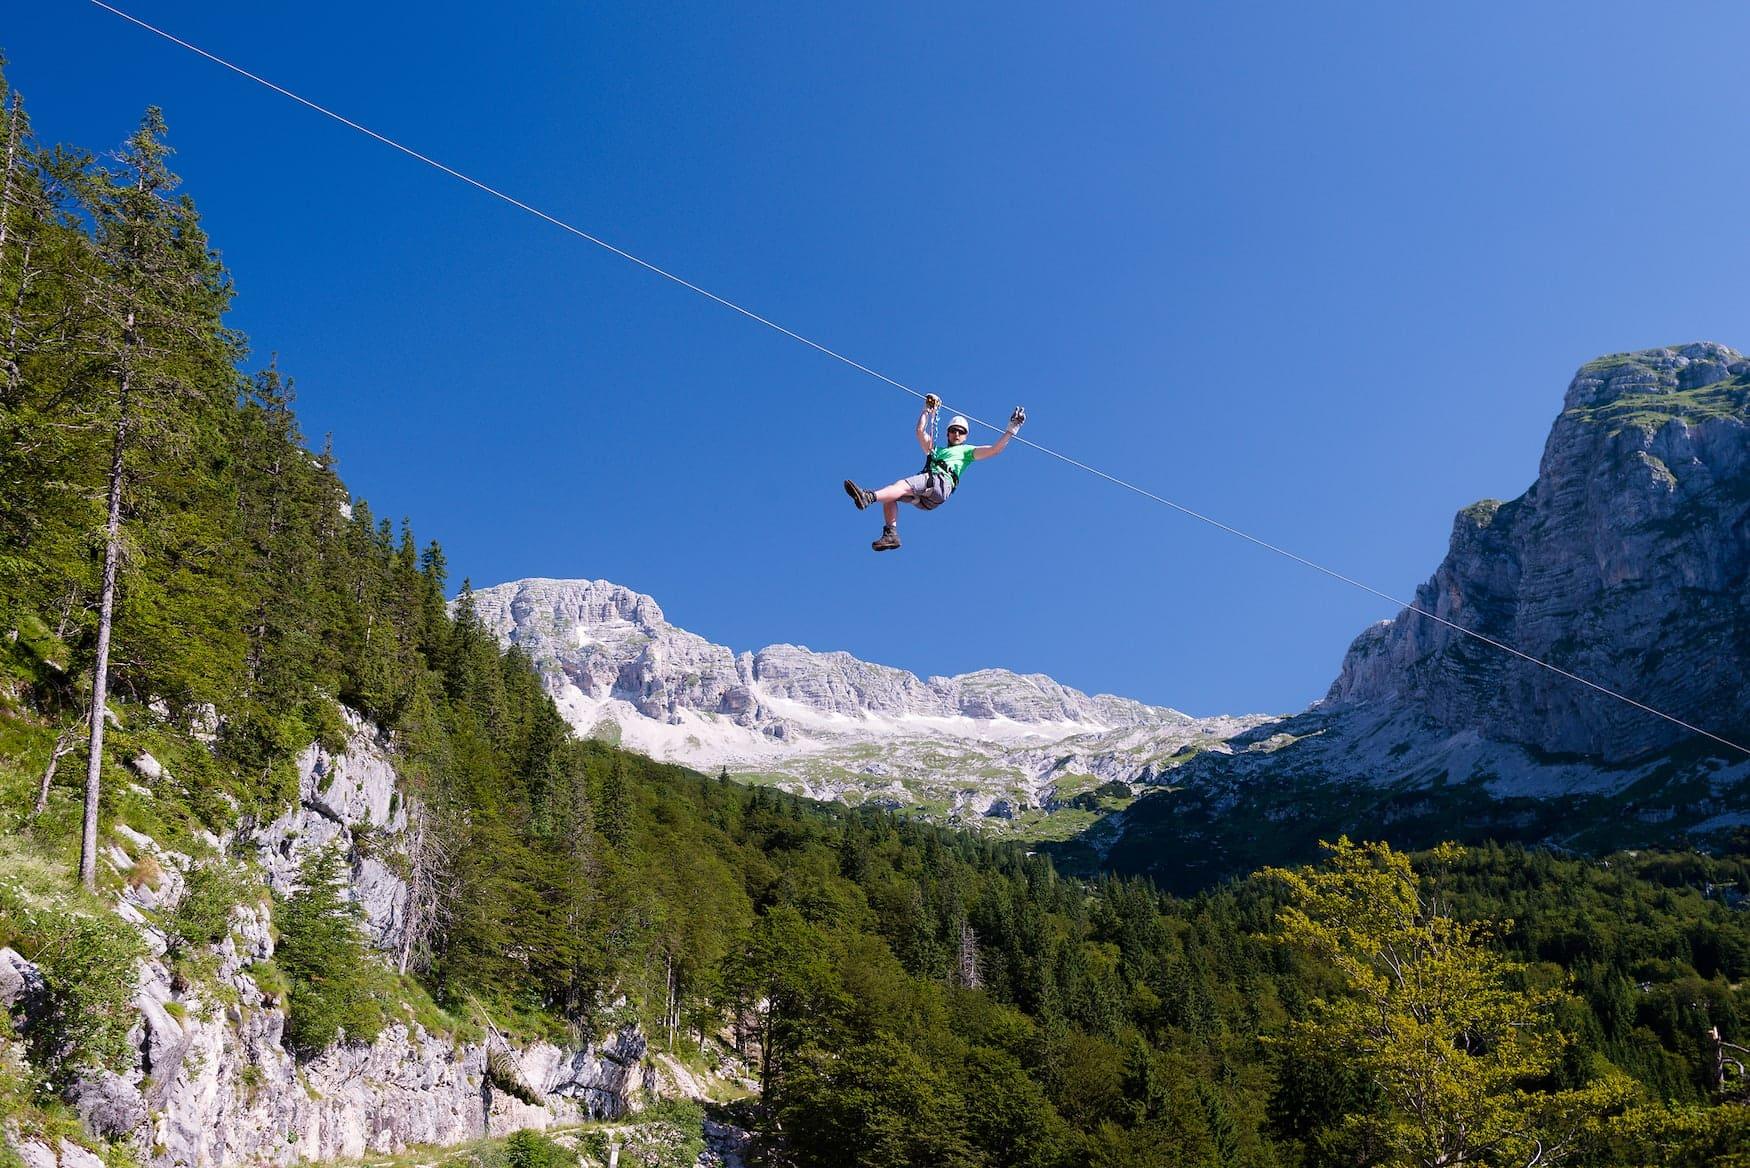 Action in Slowenien beim Ziplining in Bovec